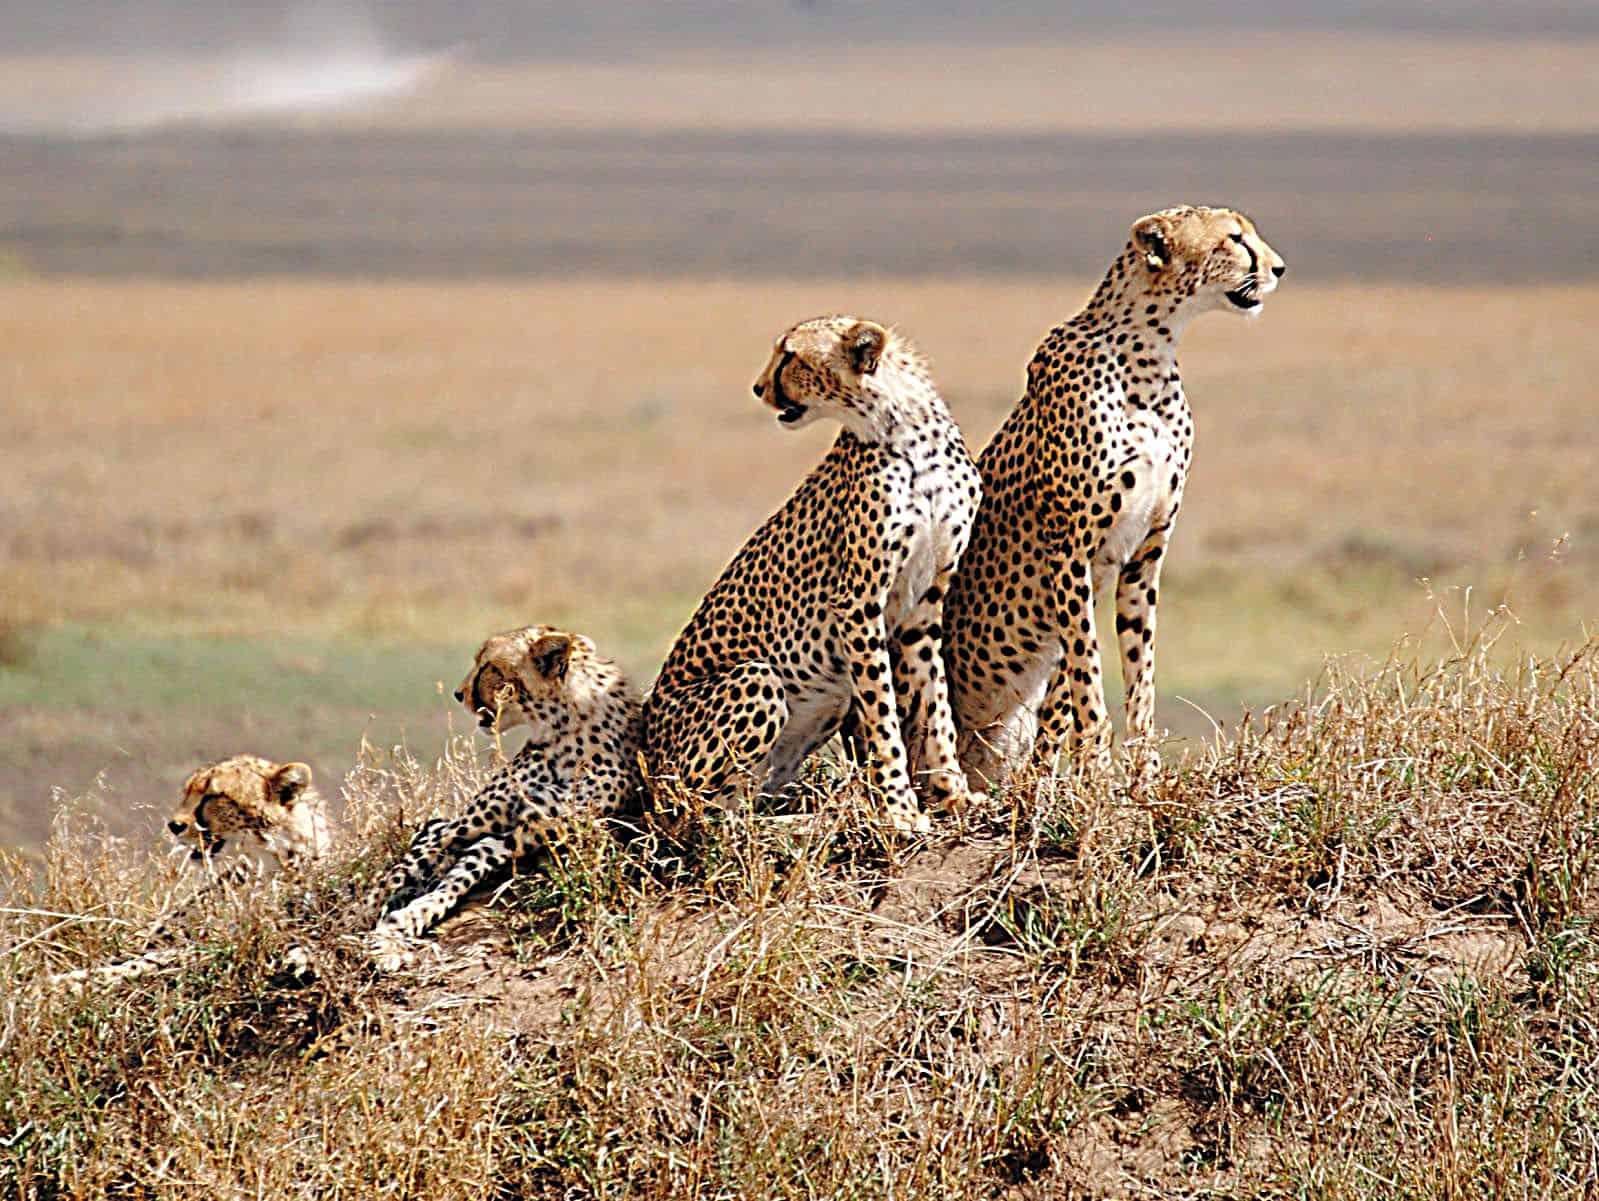 Day 4 Serengeti National Park